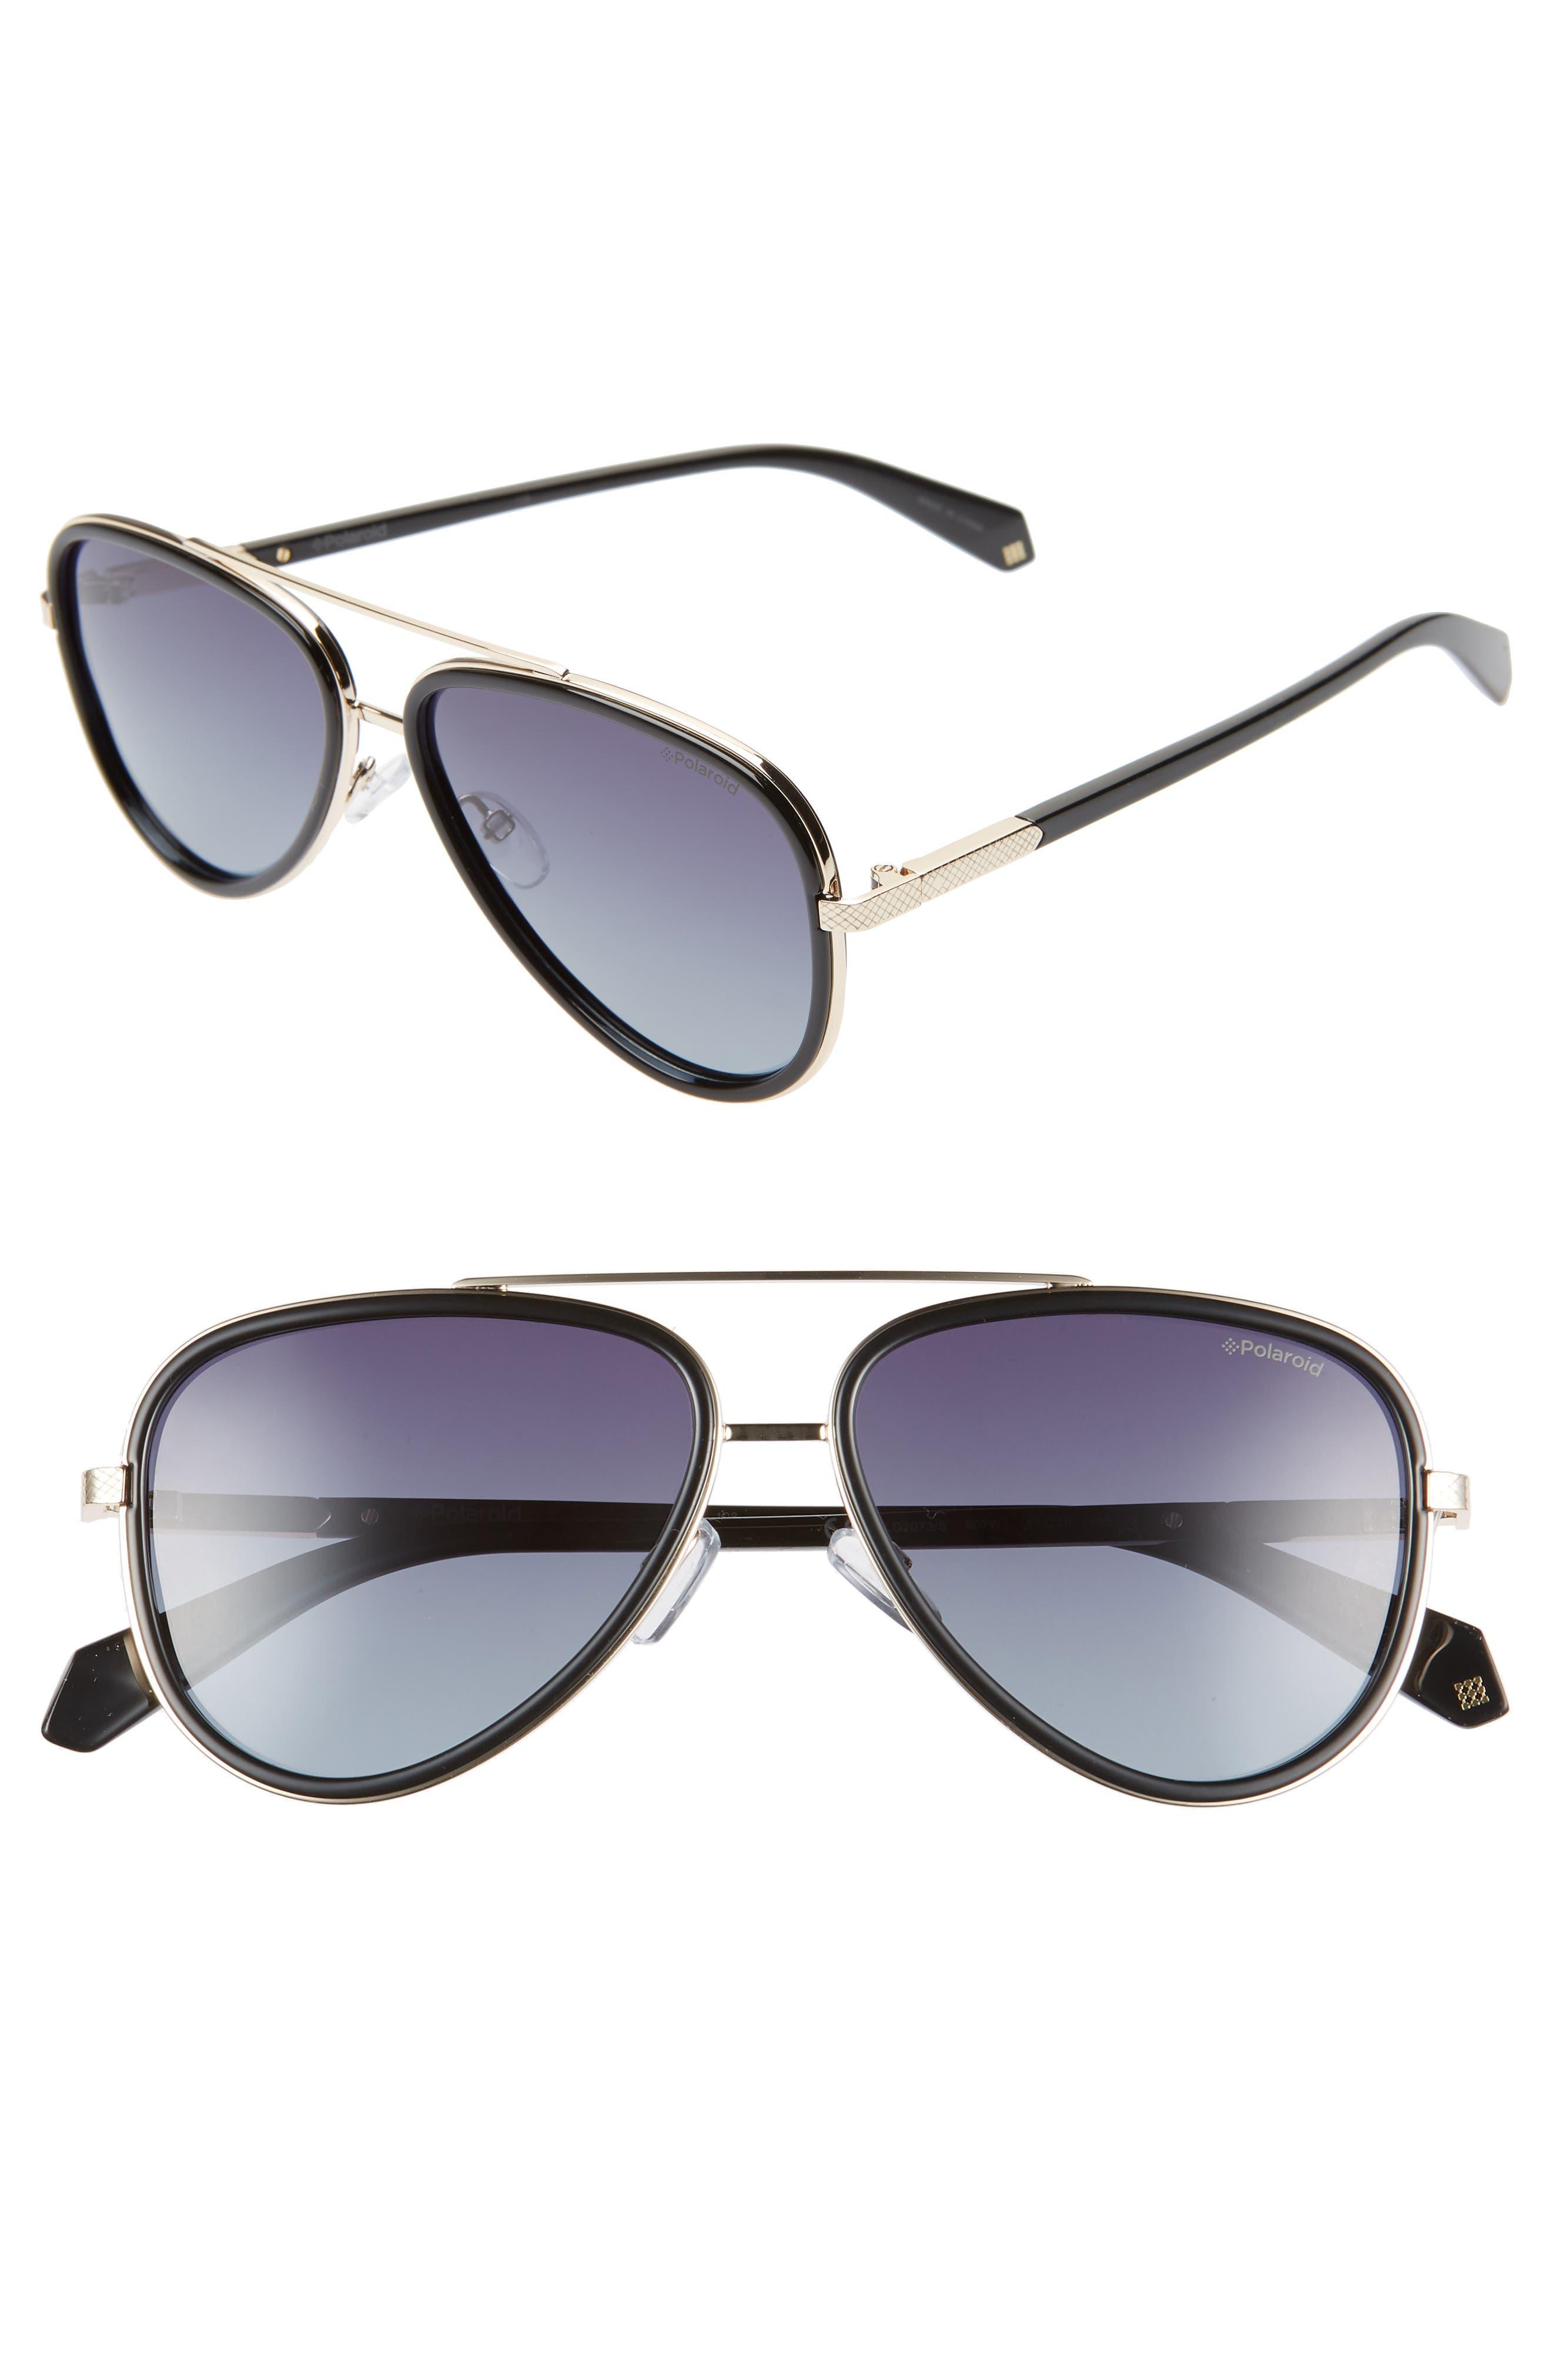 Polaroid 57Mm Polarized Aviator Sunglasses - Black